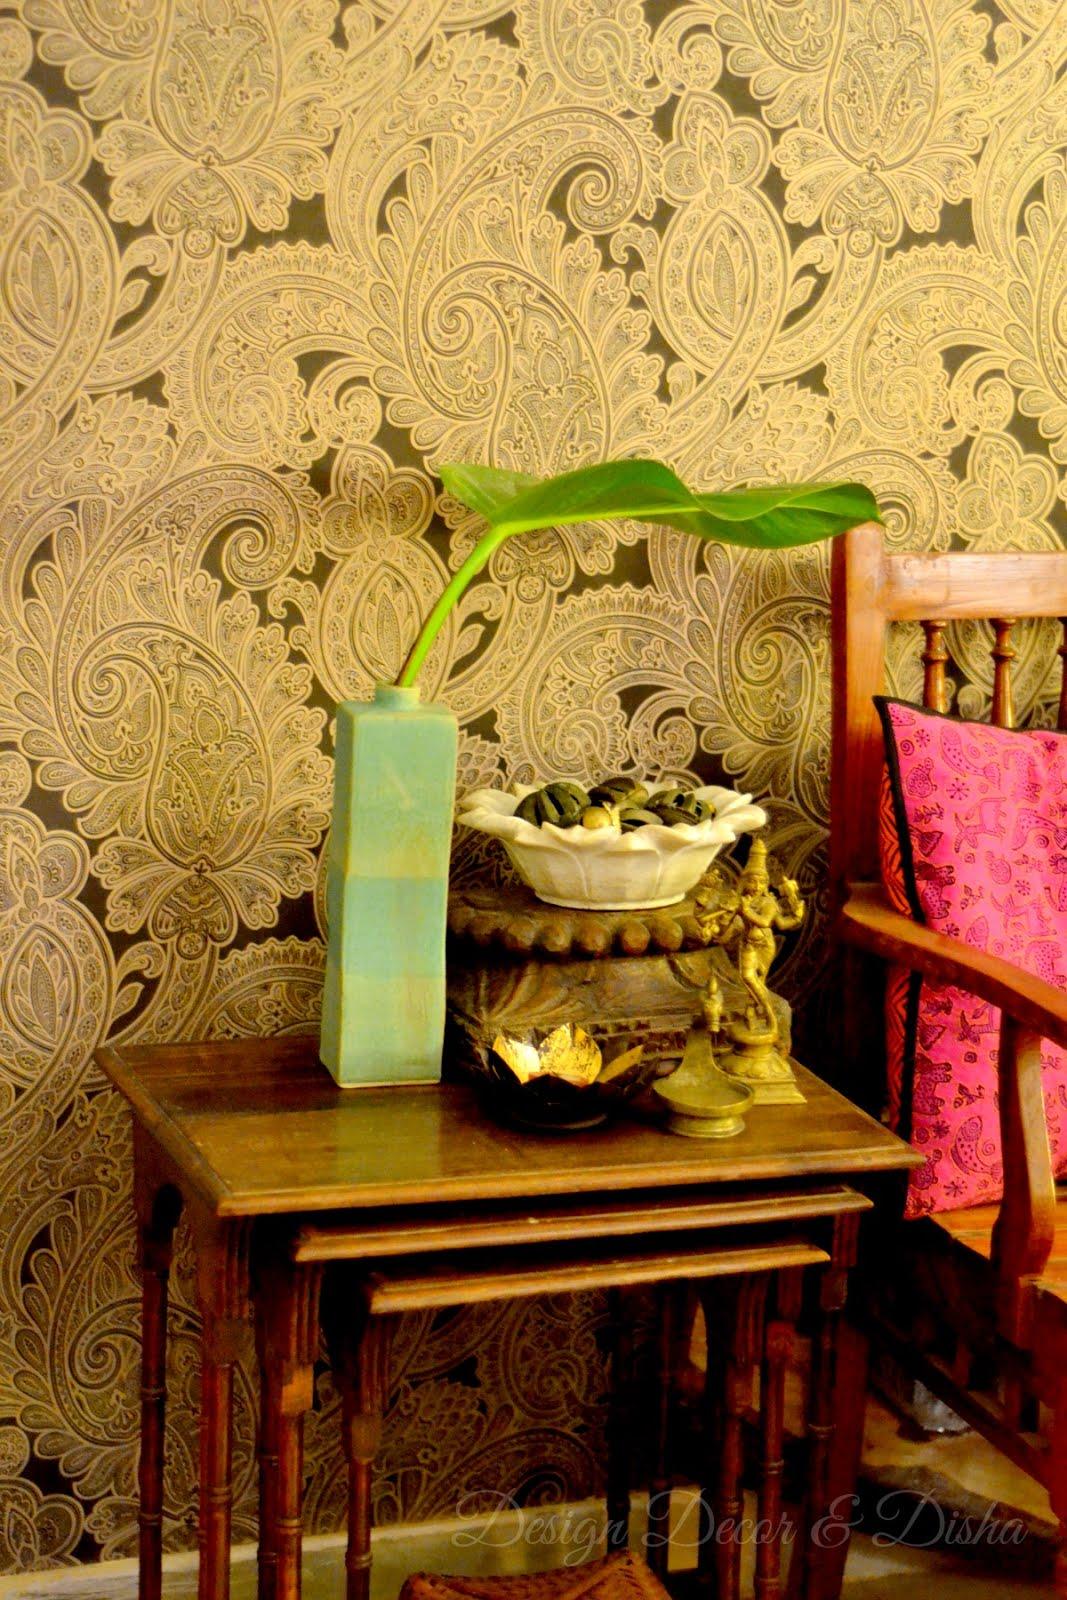 Design Decor Disha An Indian Design Decor Blog March 2016